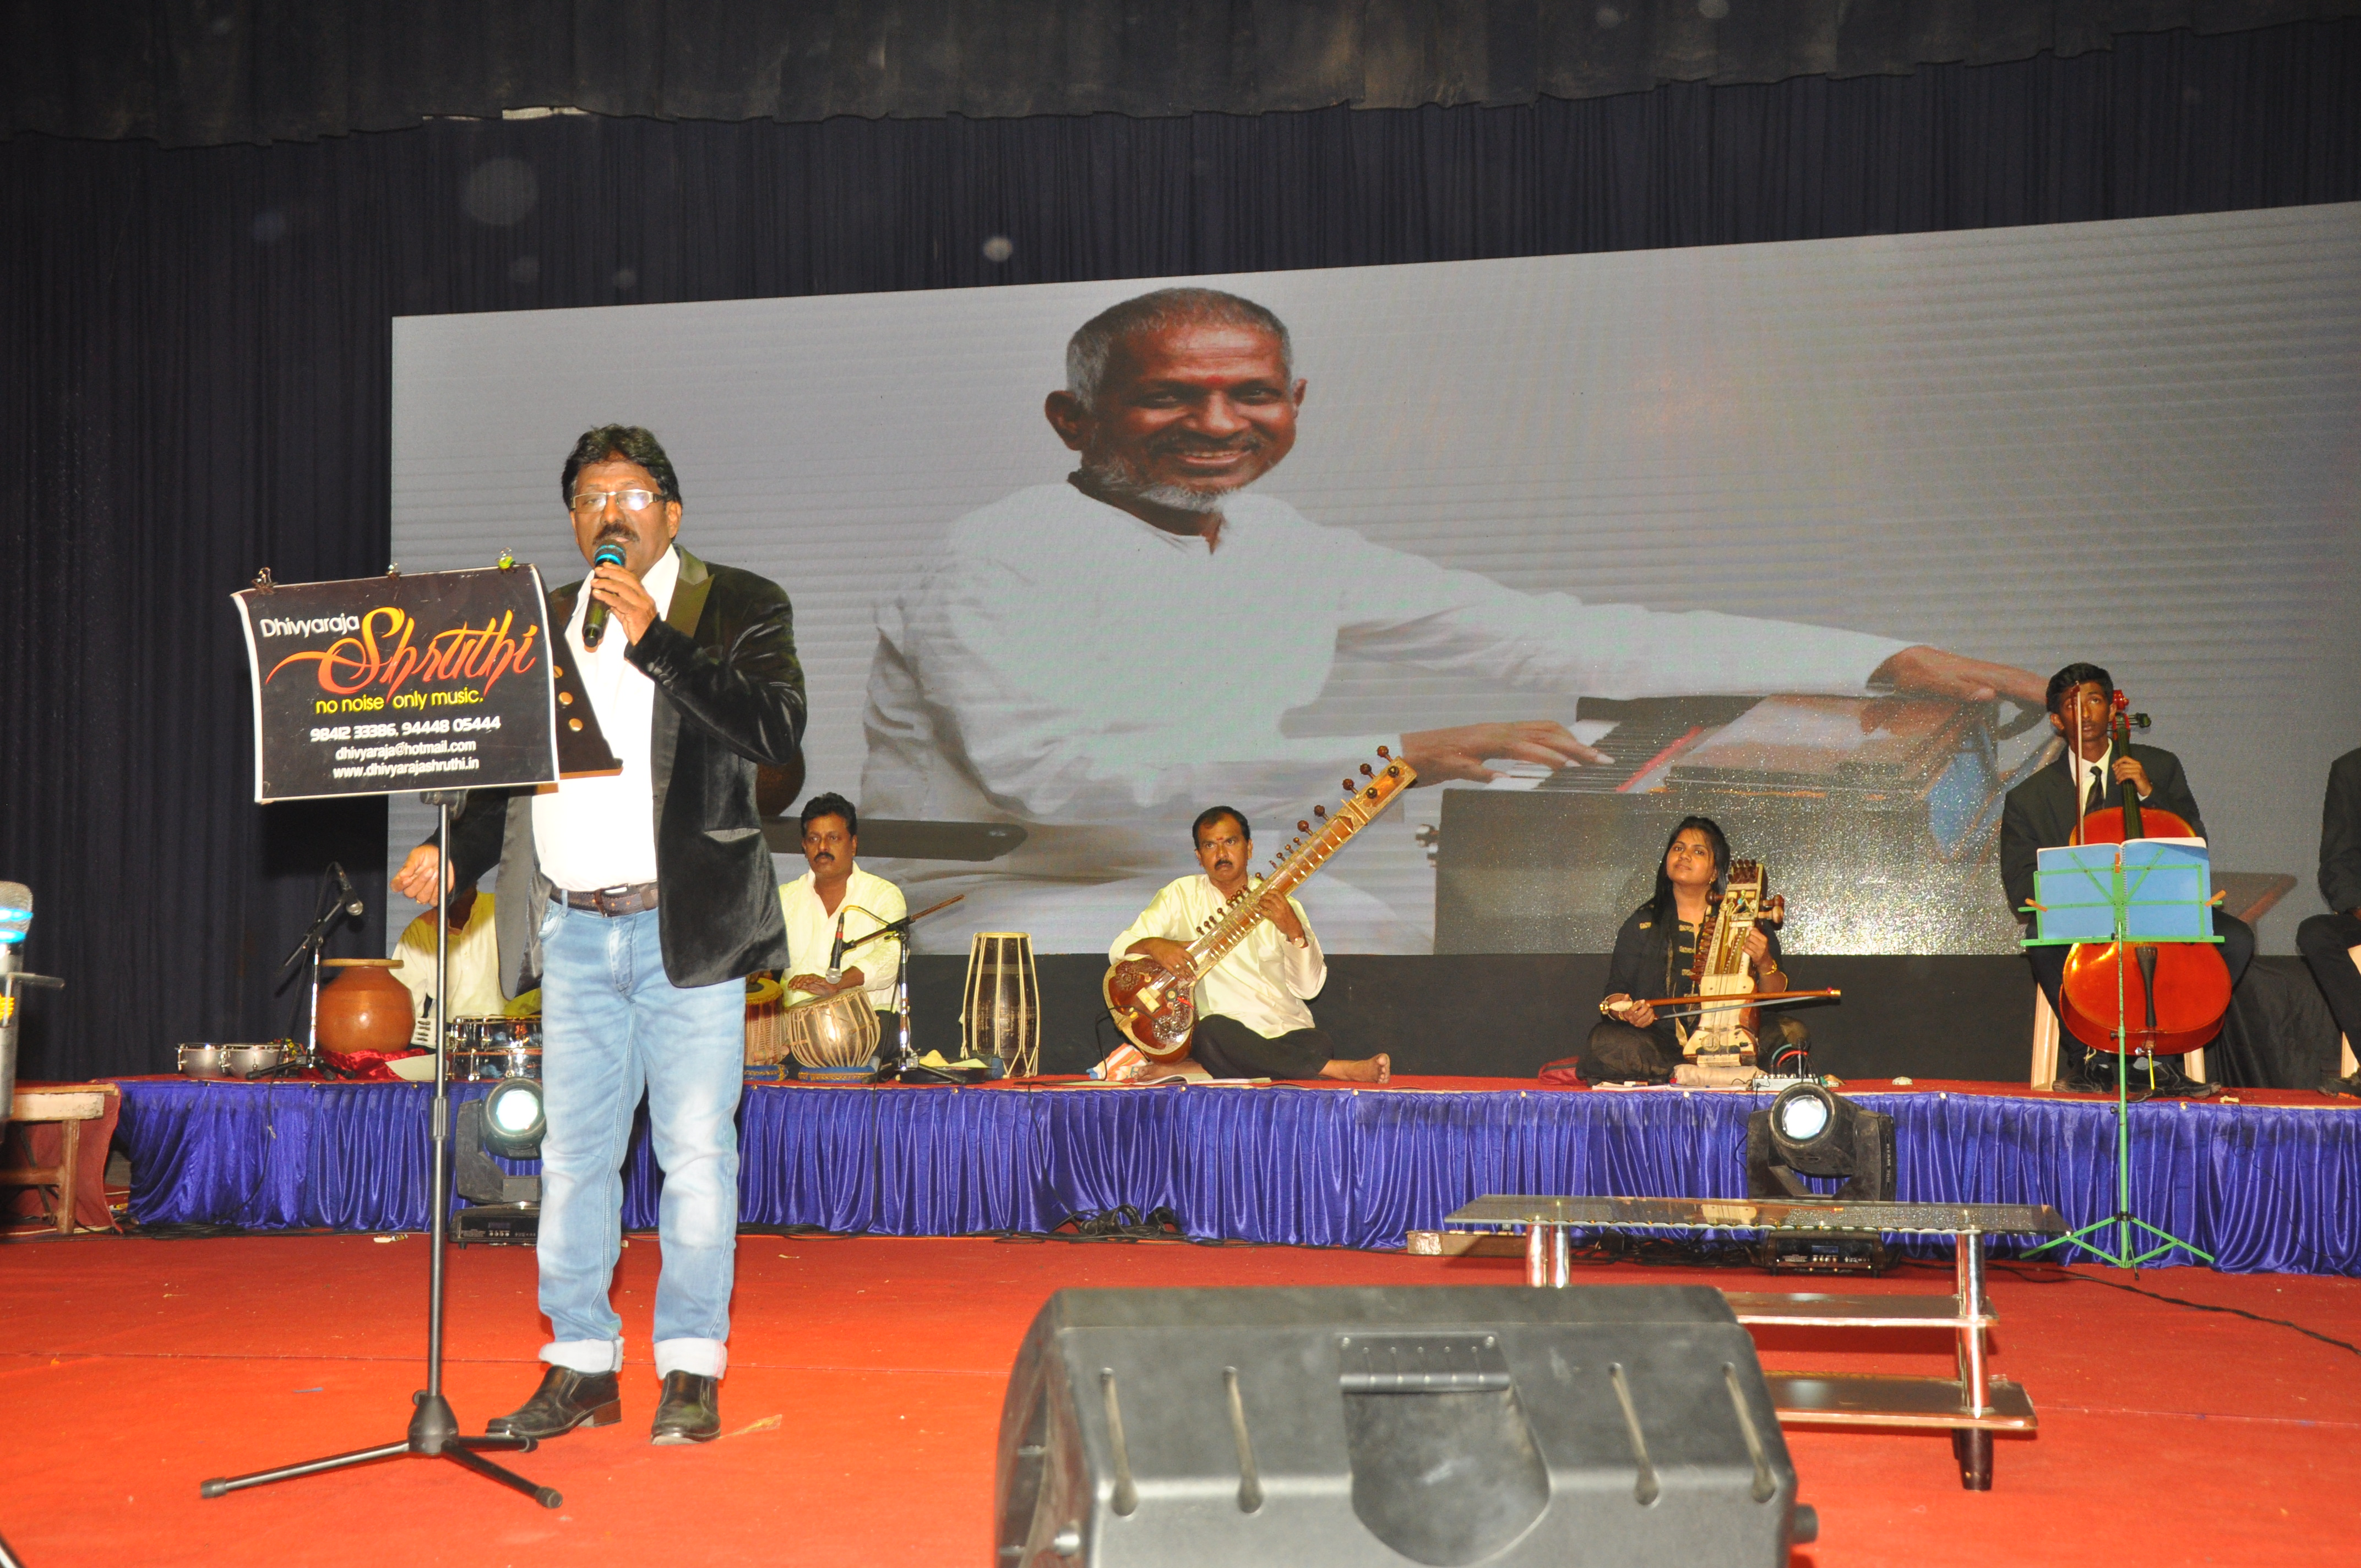 orchestra in chennai - Dhivyaraja Shruthi